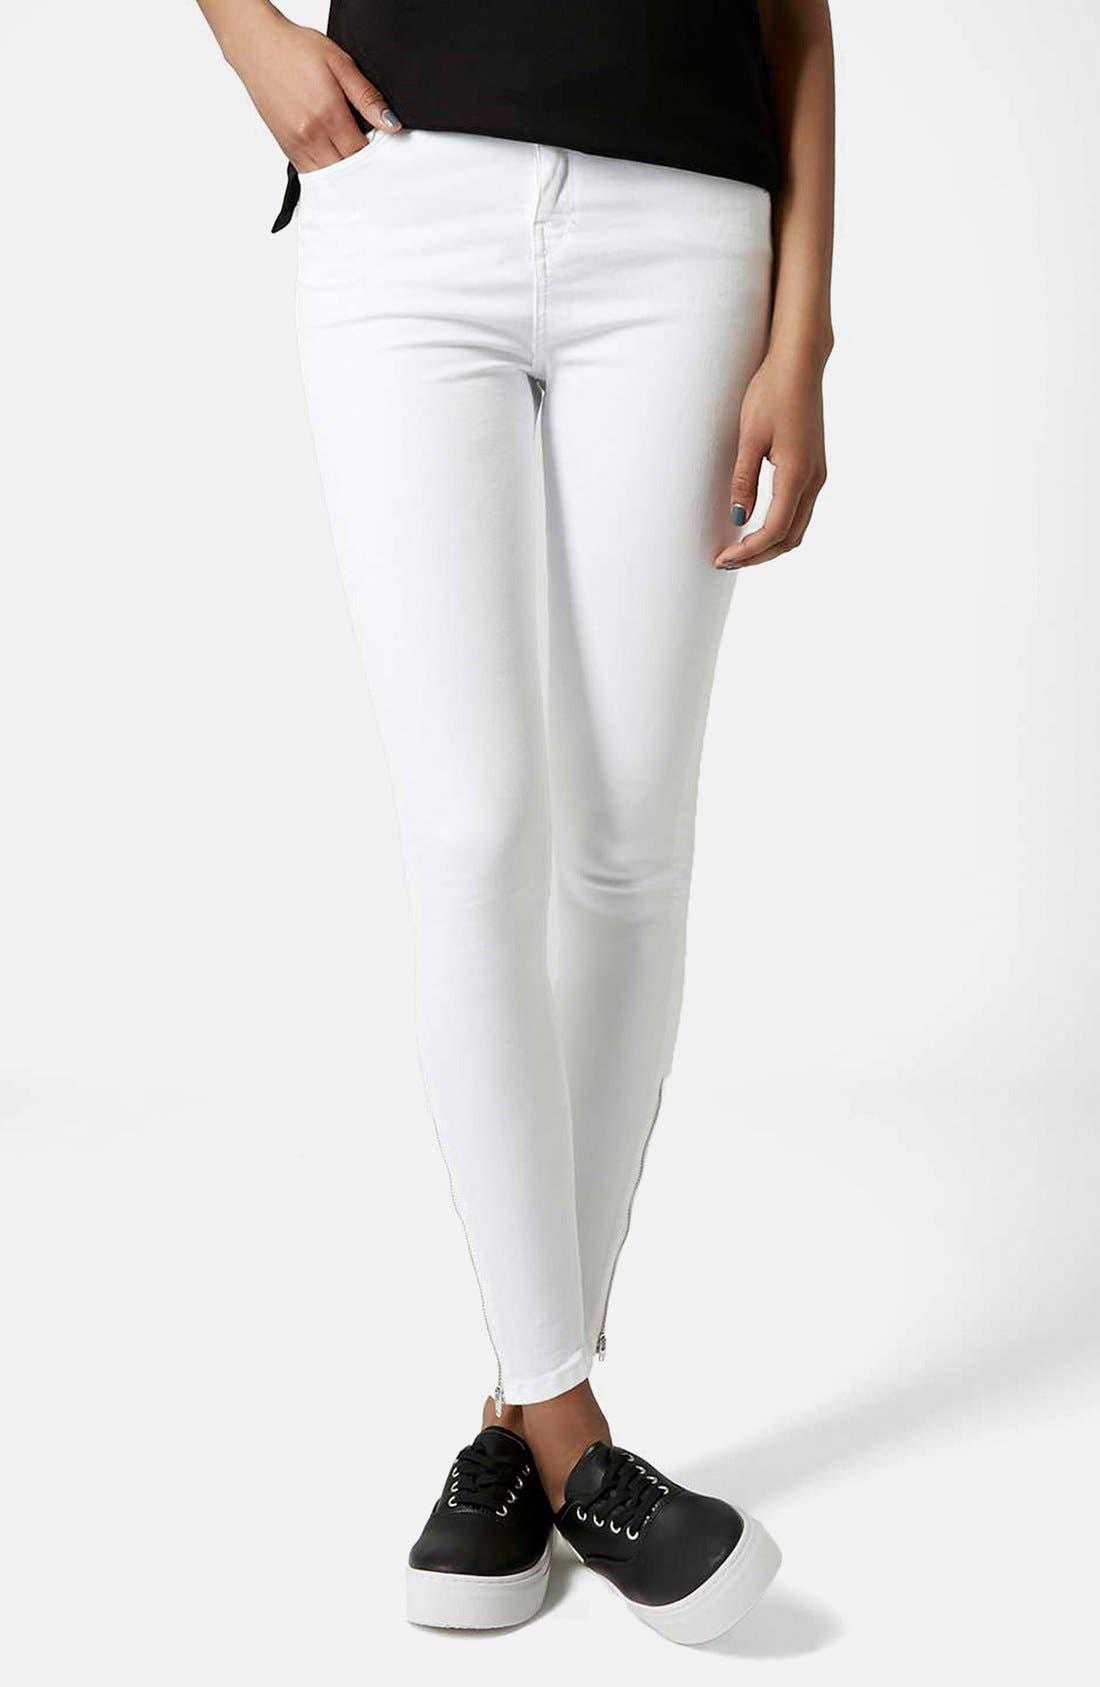 Alternate Image 1 Selected - Topshop Moto 'Jamie' Ankle Zip Jeans (White) (Regular & Short)